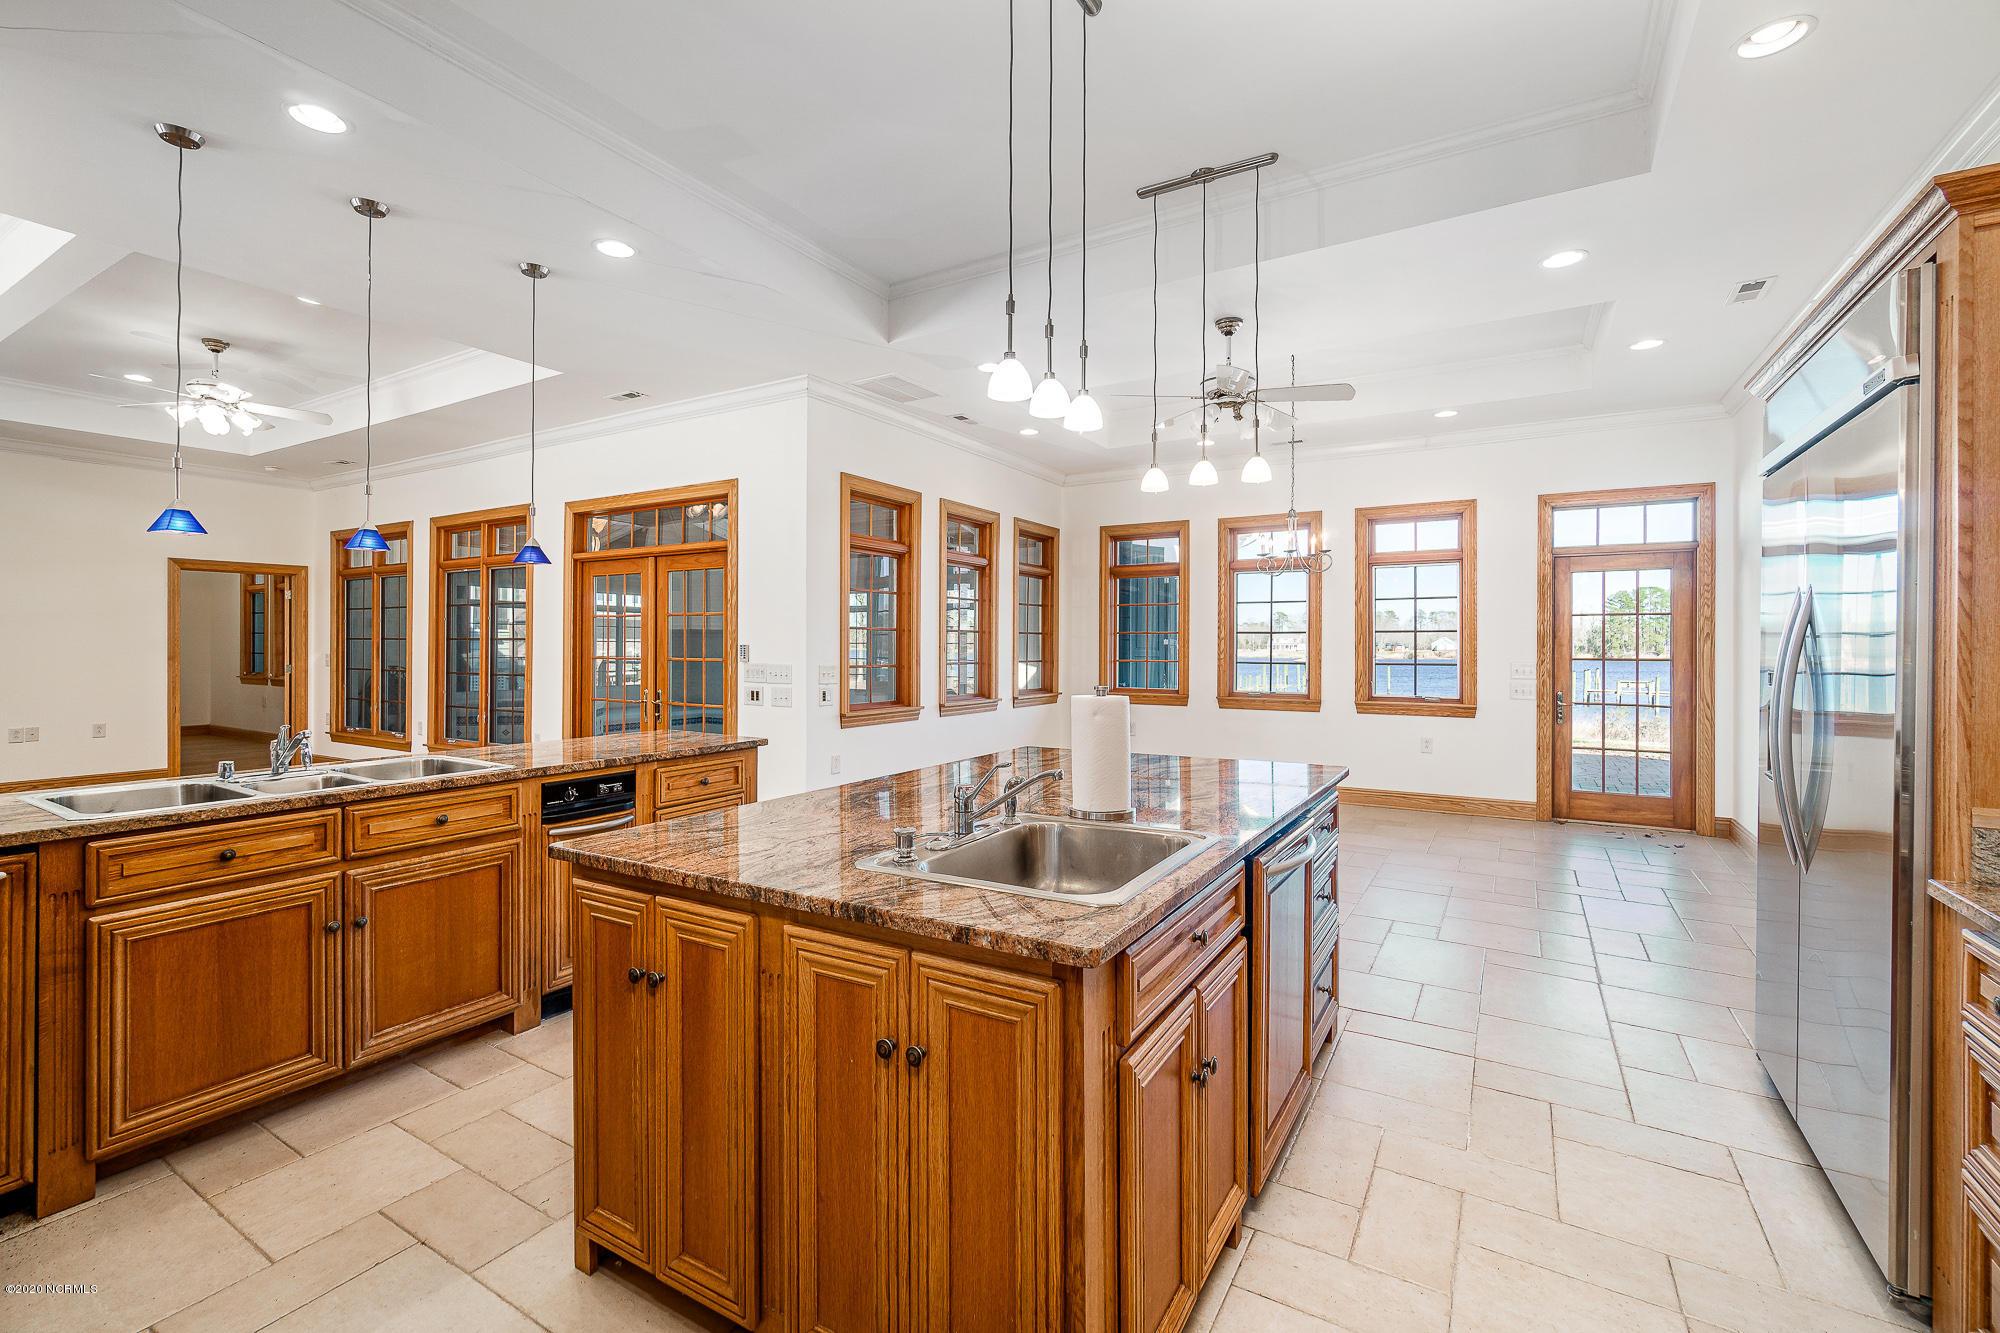 105 Bimini Court, Havelock, North Carolina 28532, 4 Bedrooms Bedrooms, 11 Rooms Rooms,4 BathroomsBathrooms,Single family residence,For sale,Bimini,100208929